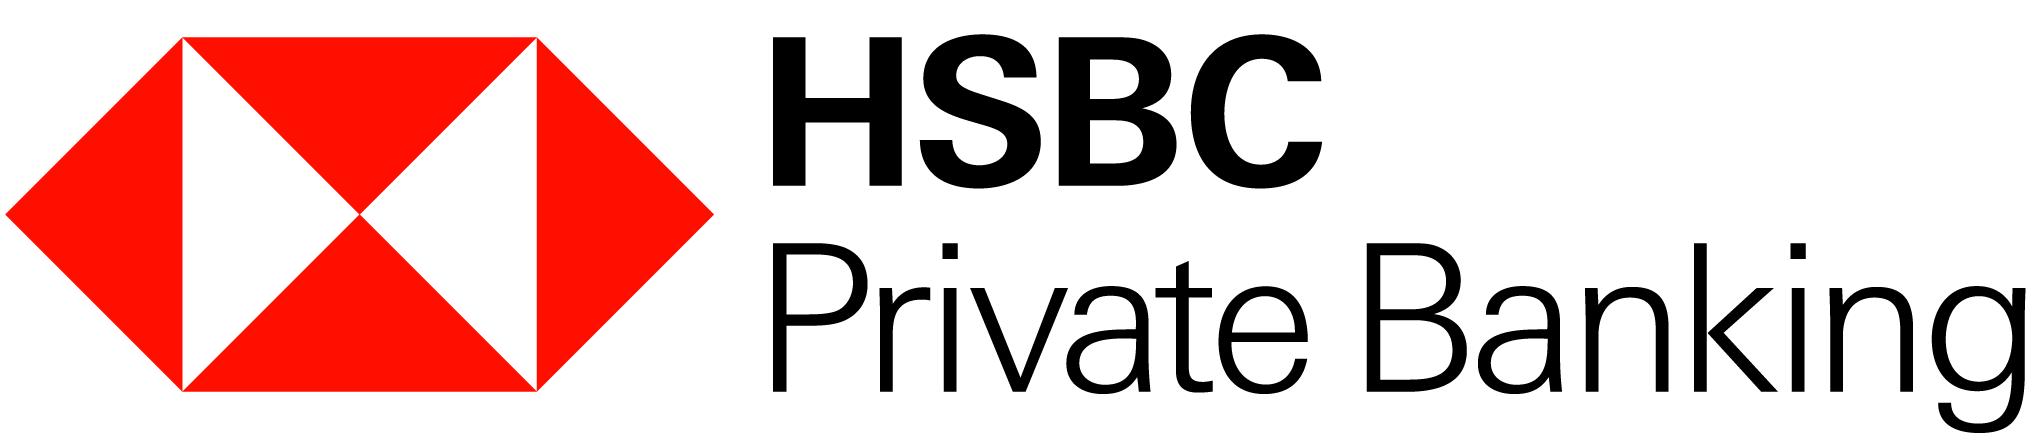 HSBC PB